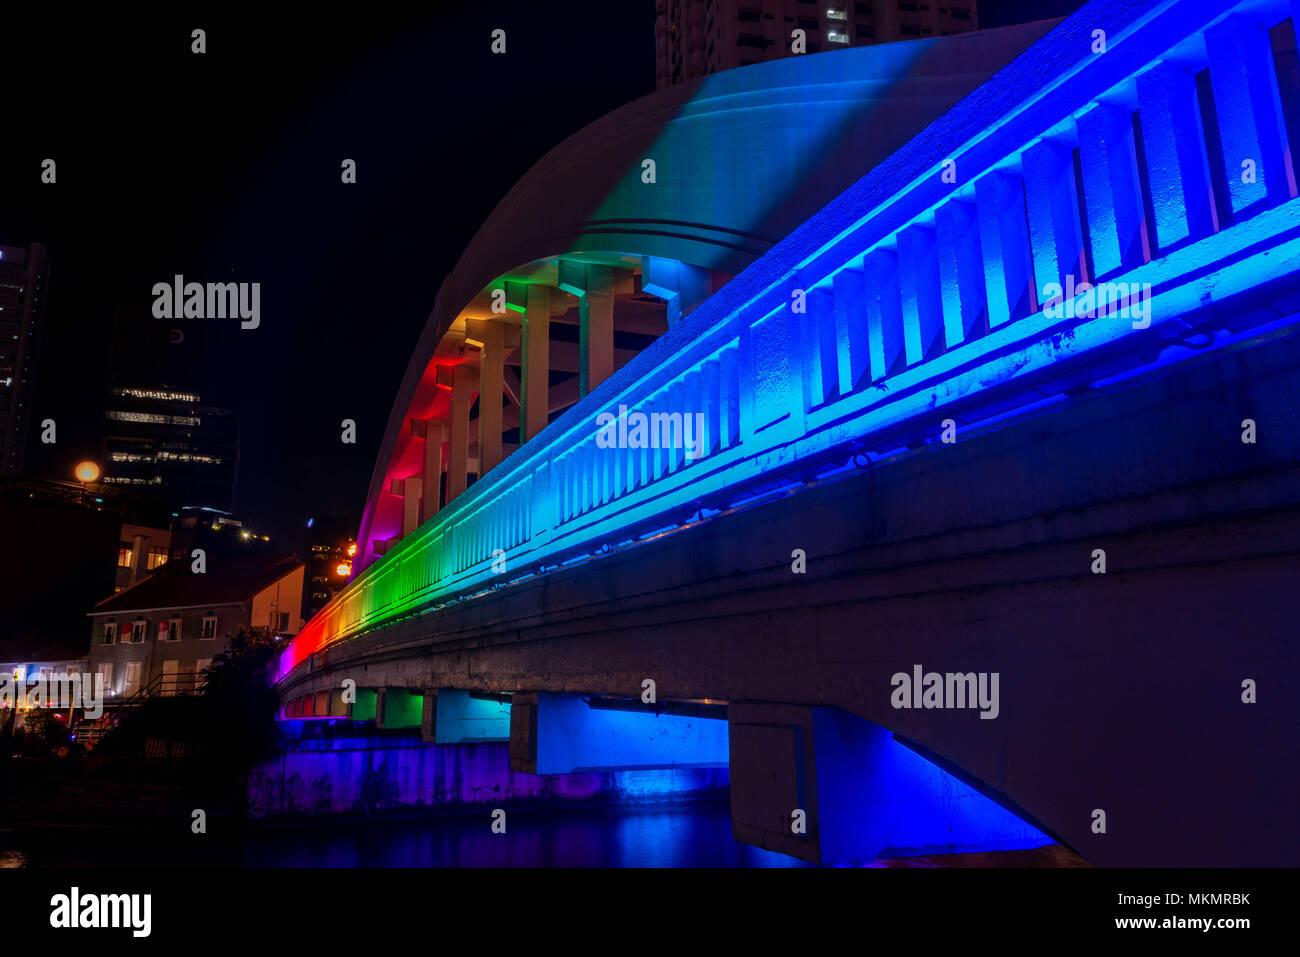 Rainbow colors on the Elgin Bridge in Singapore at night - Stock Image